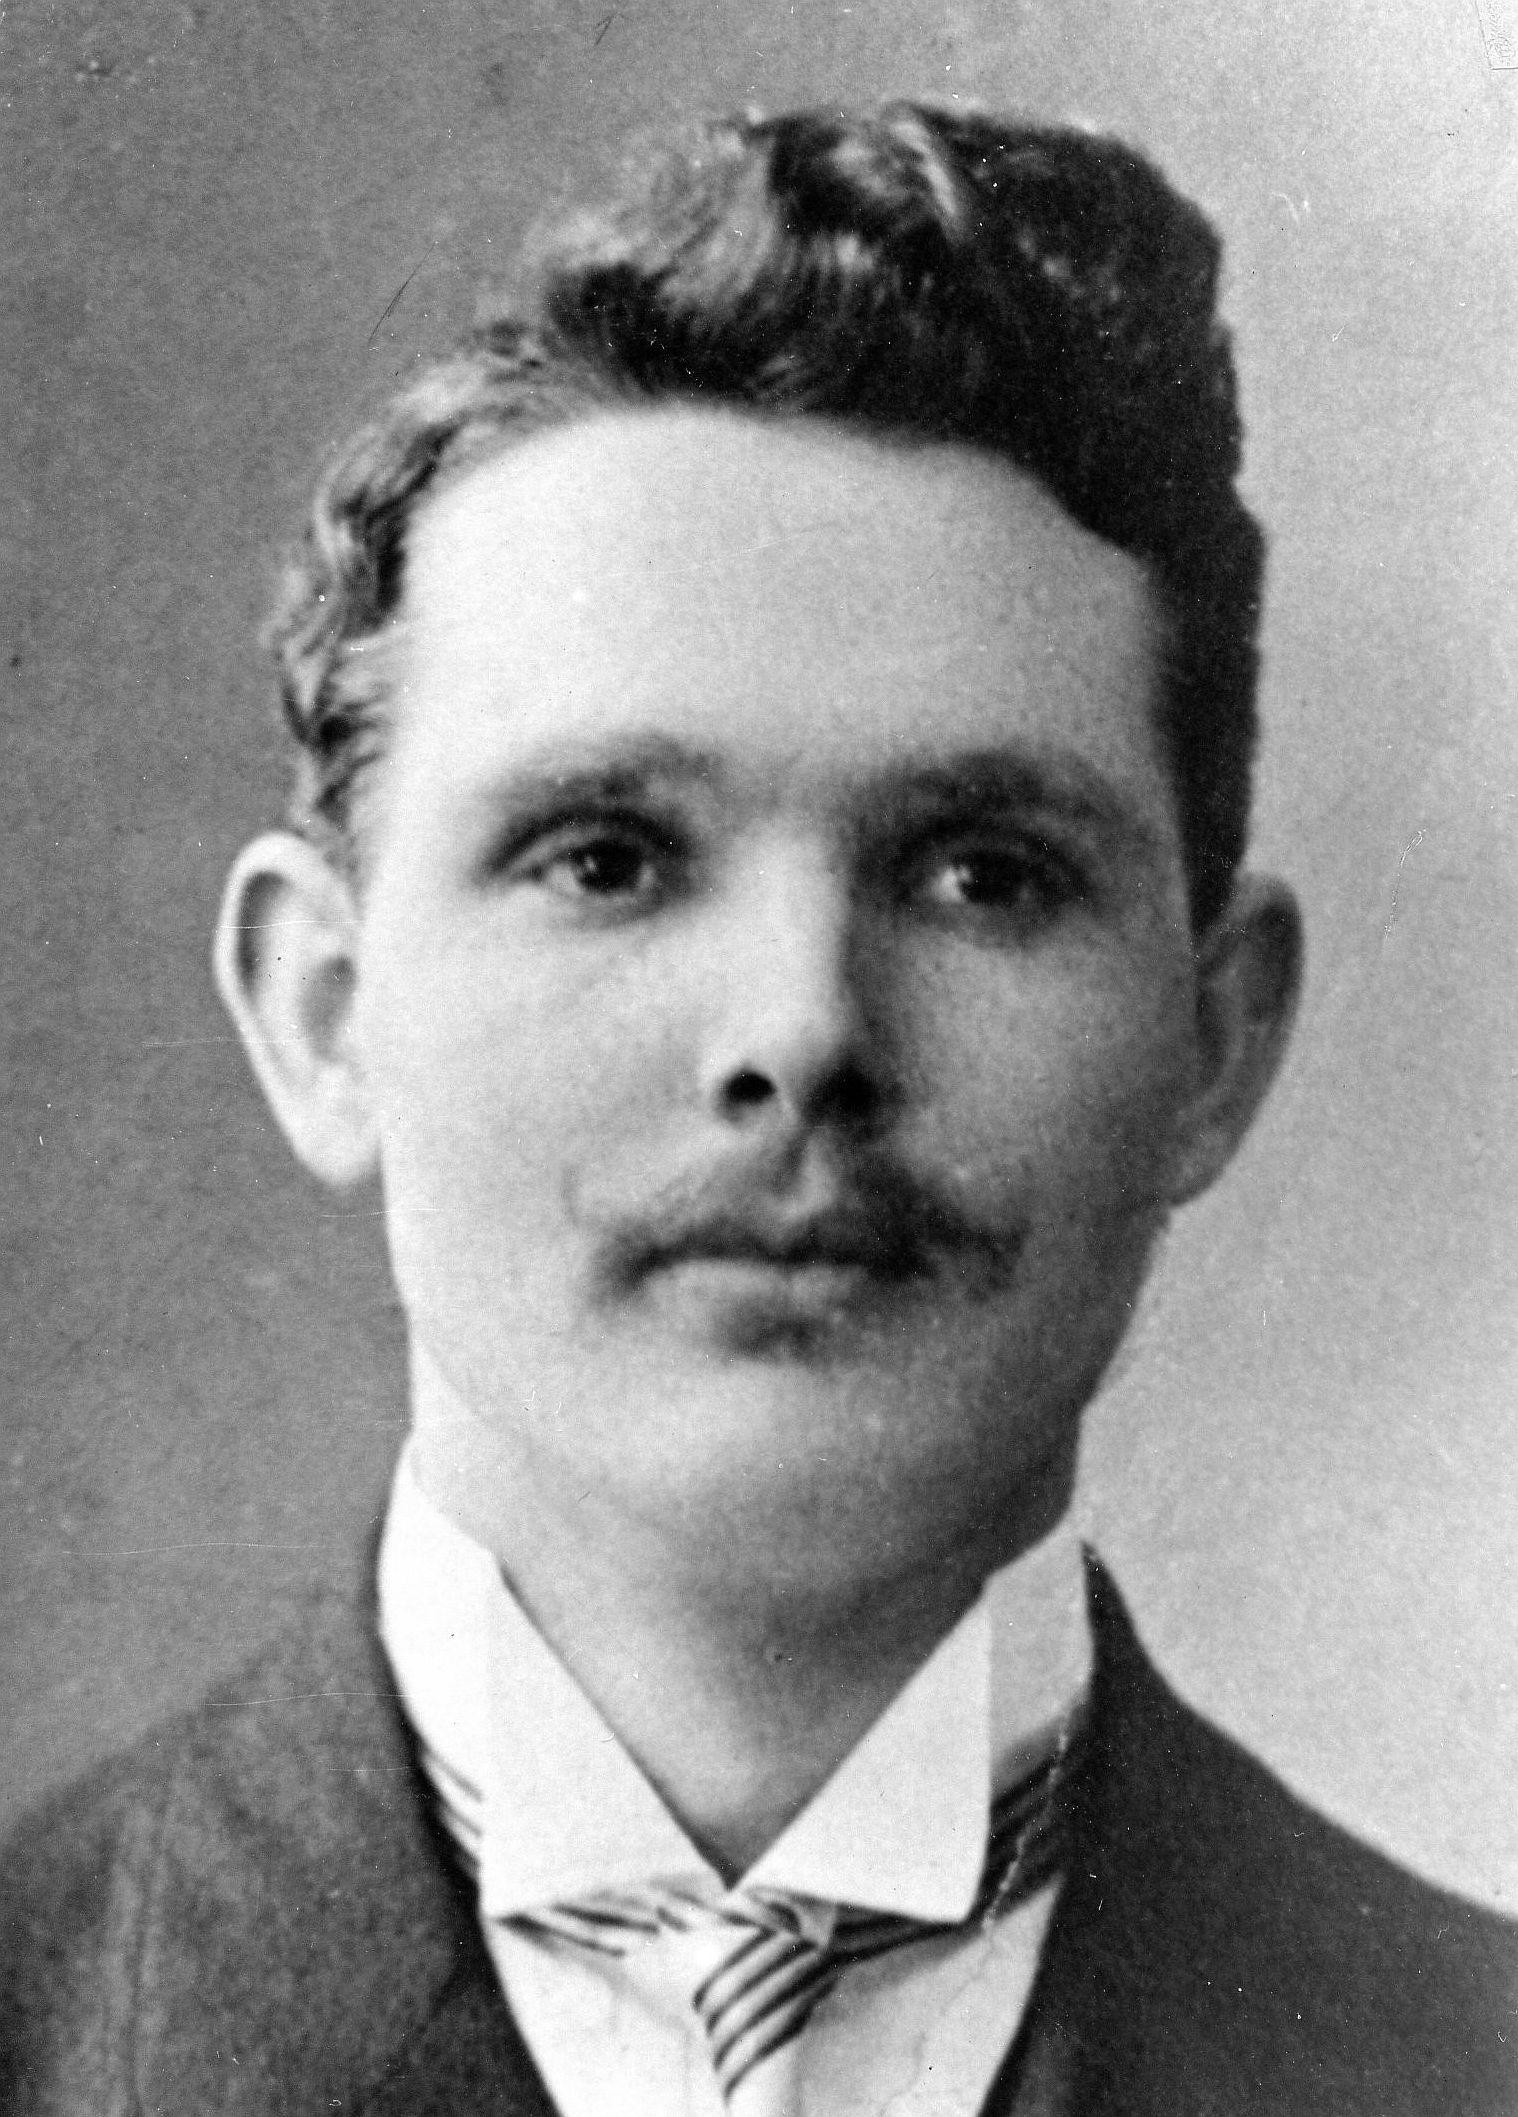 Bingham, Heber Raymond